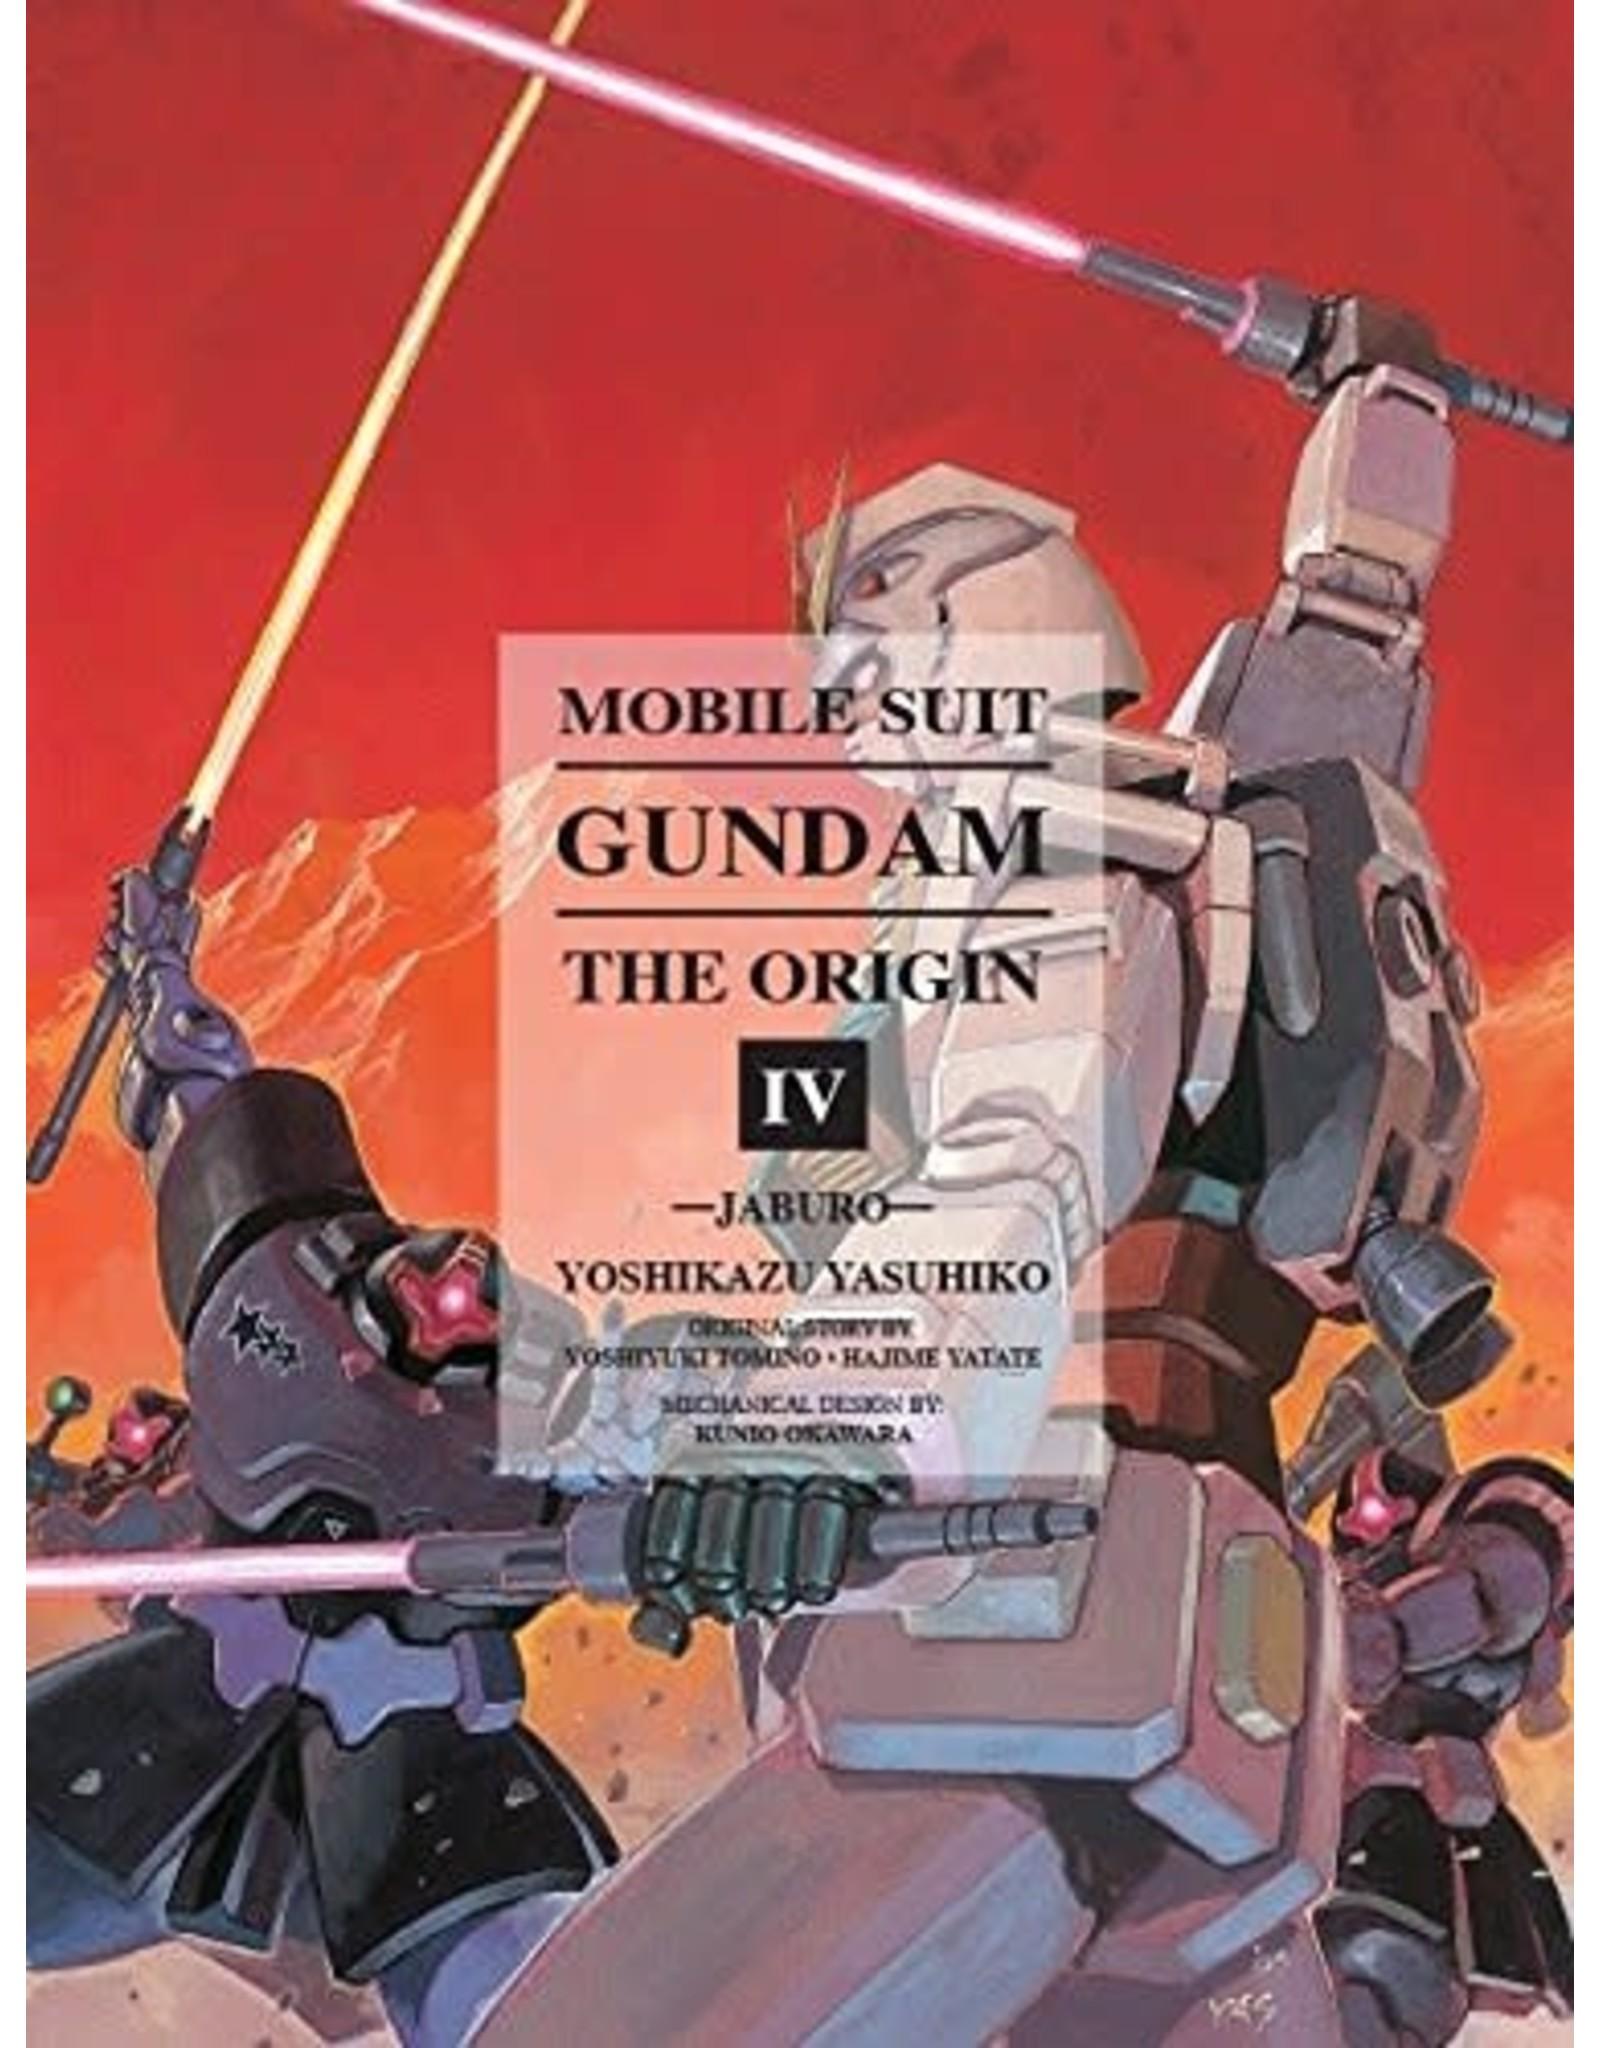 Mobile Suit Gundam: The Origin IV (Engelstalig)